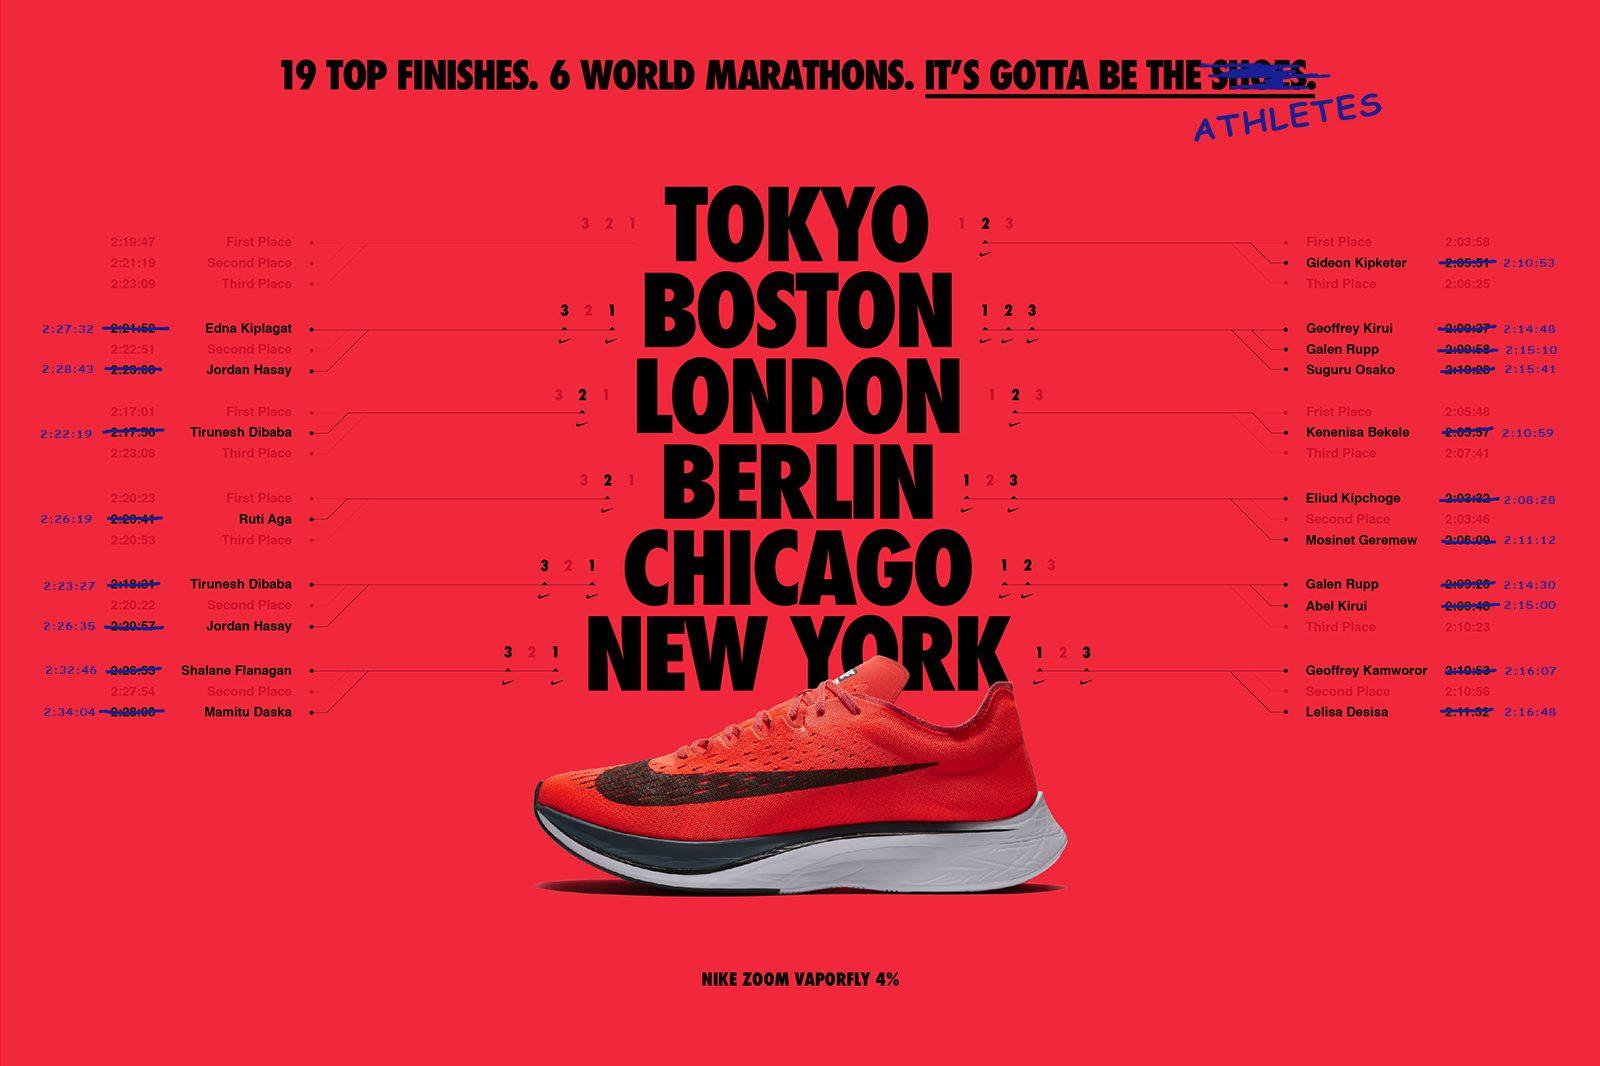 80c1cb67e55c9 Finishing times had the world s top marathoners not worn the Nike Vaporfly  4% - Canadian Running Magazine